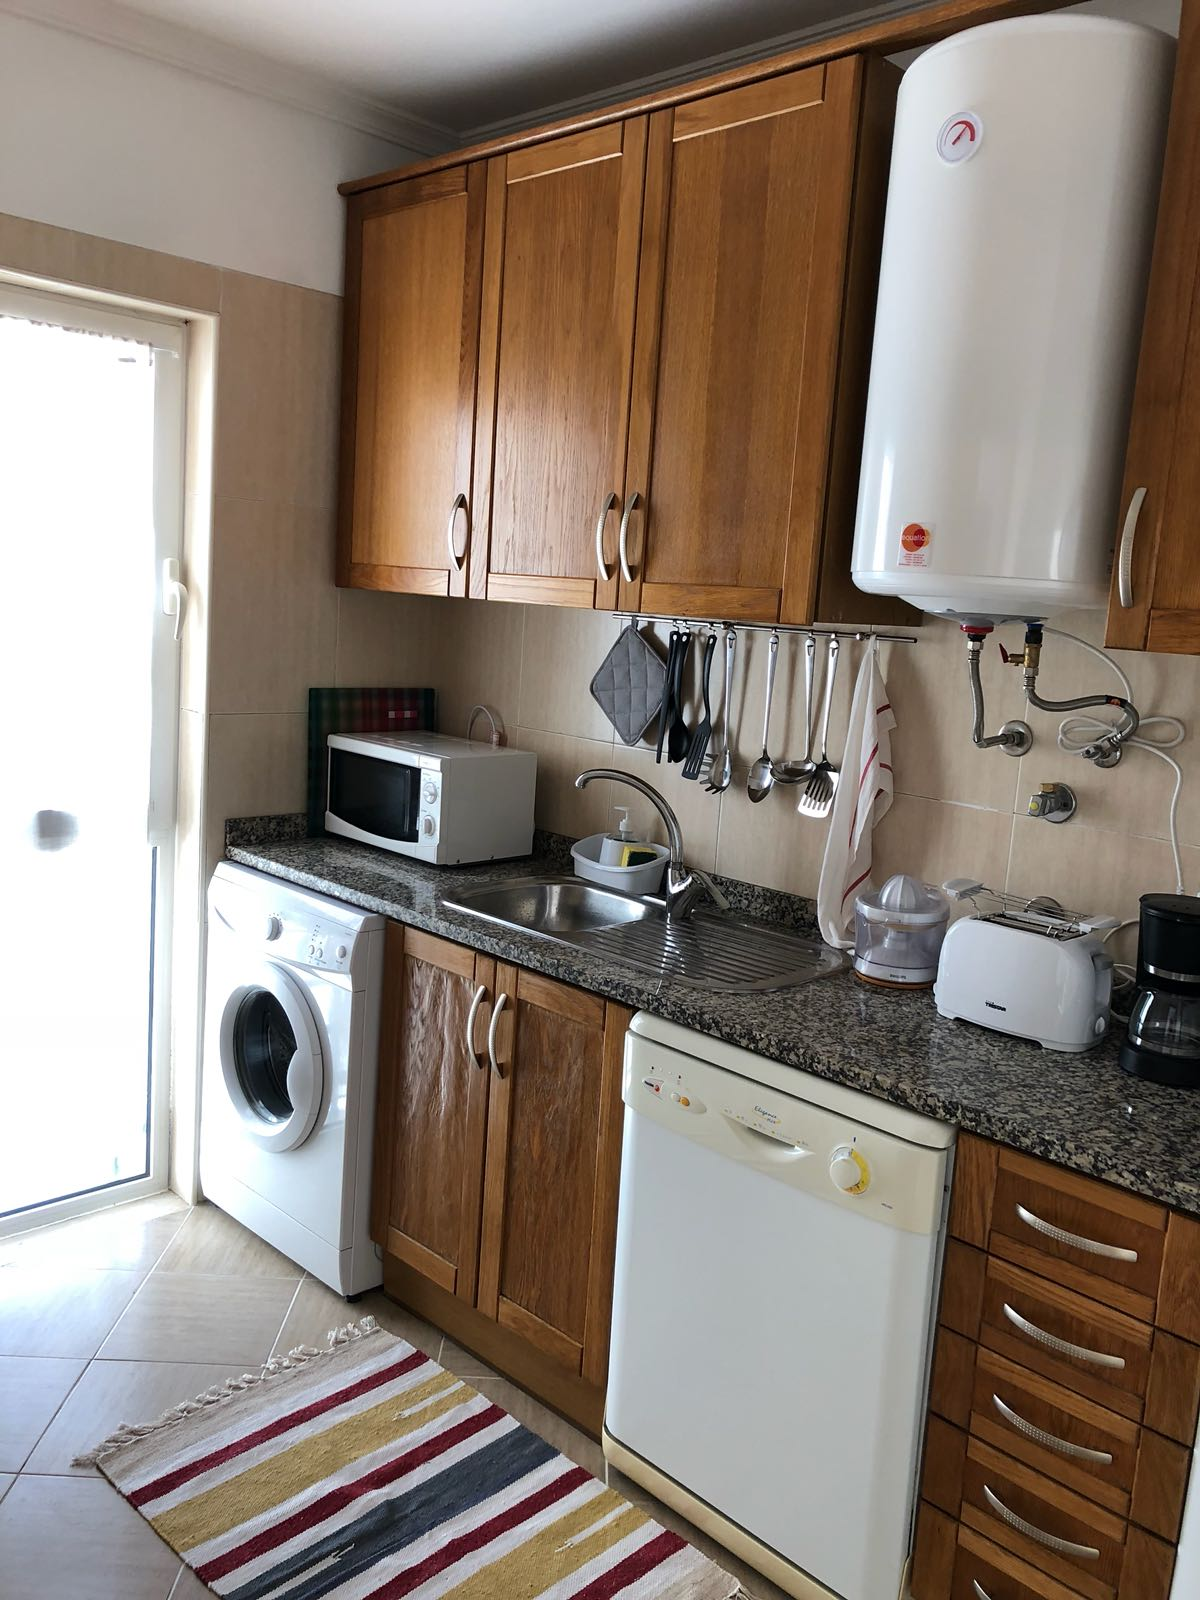 Holiday apartments and villas for rent, Apartamento T1 - Albufeira - Piscina e Garagem in Albufeira, Portugal Algarve, REF_IMG_6128_6133